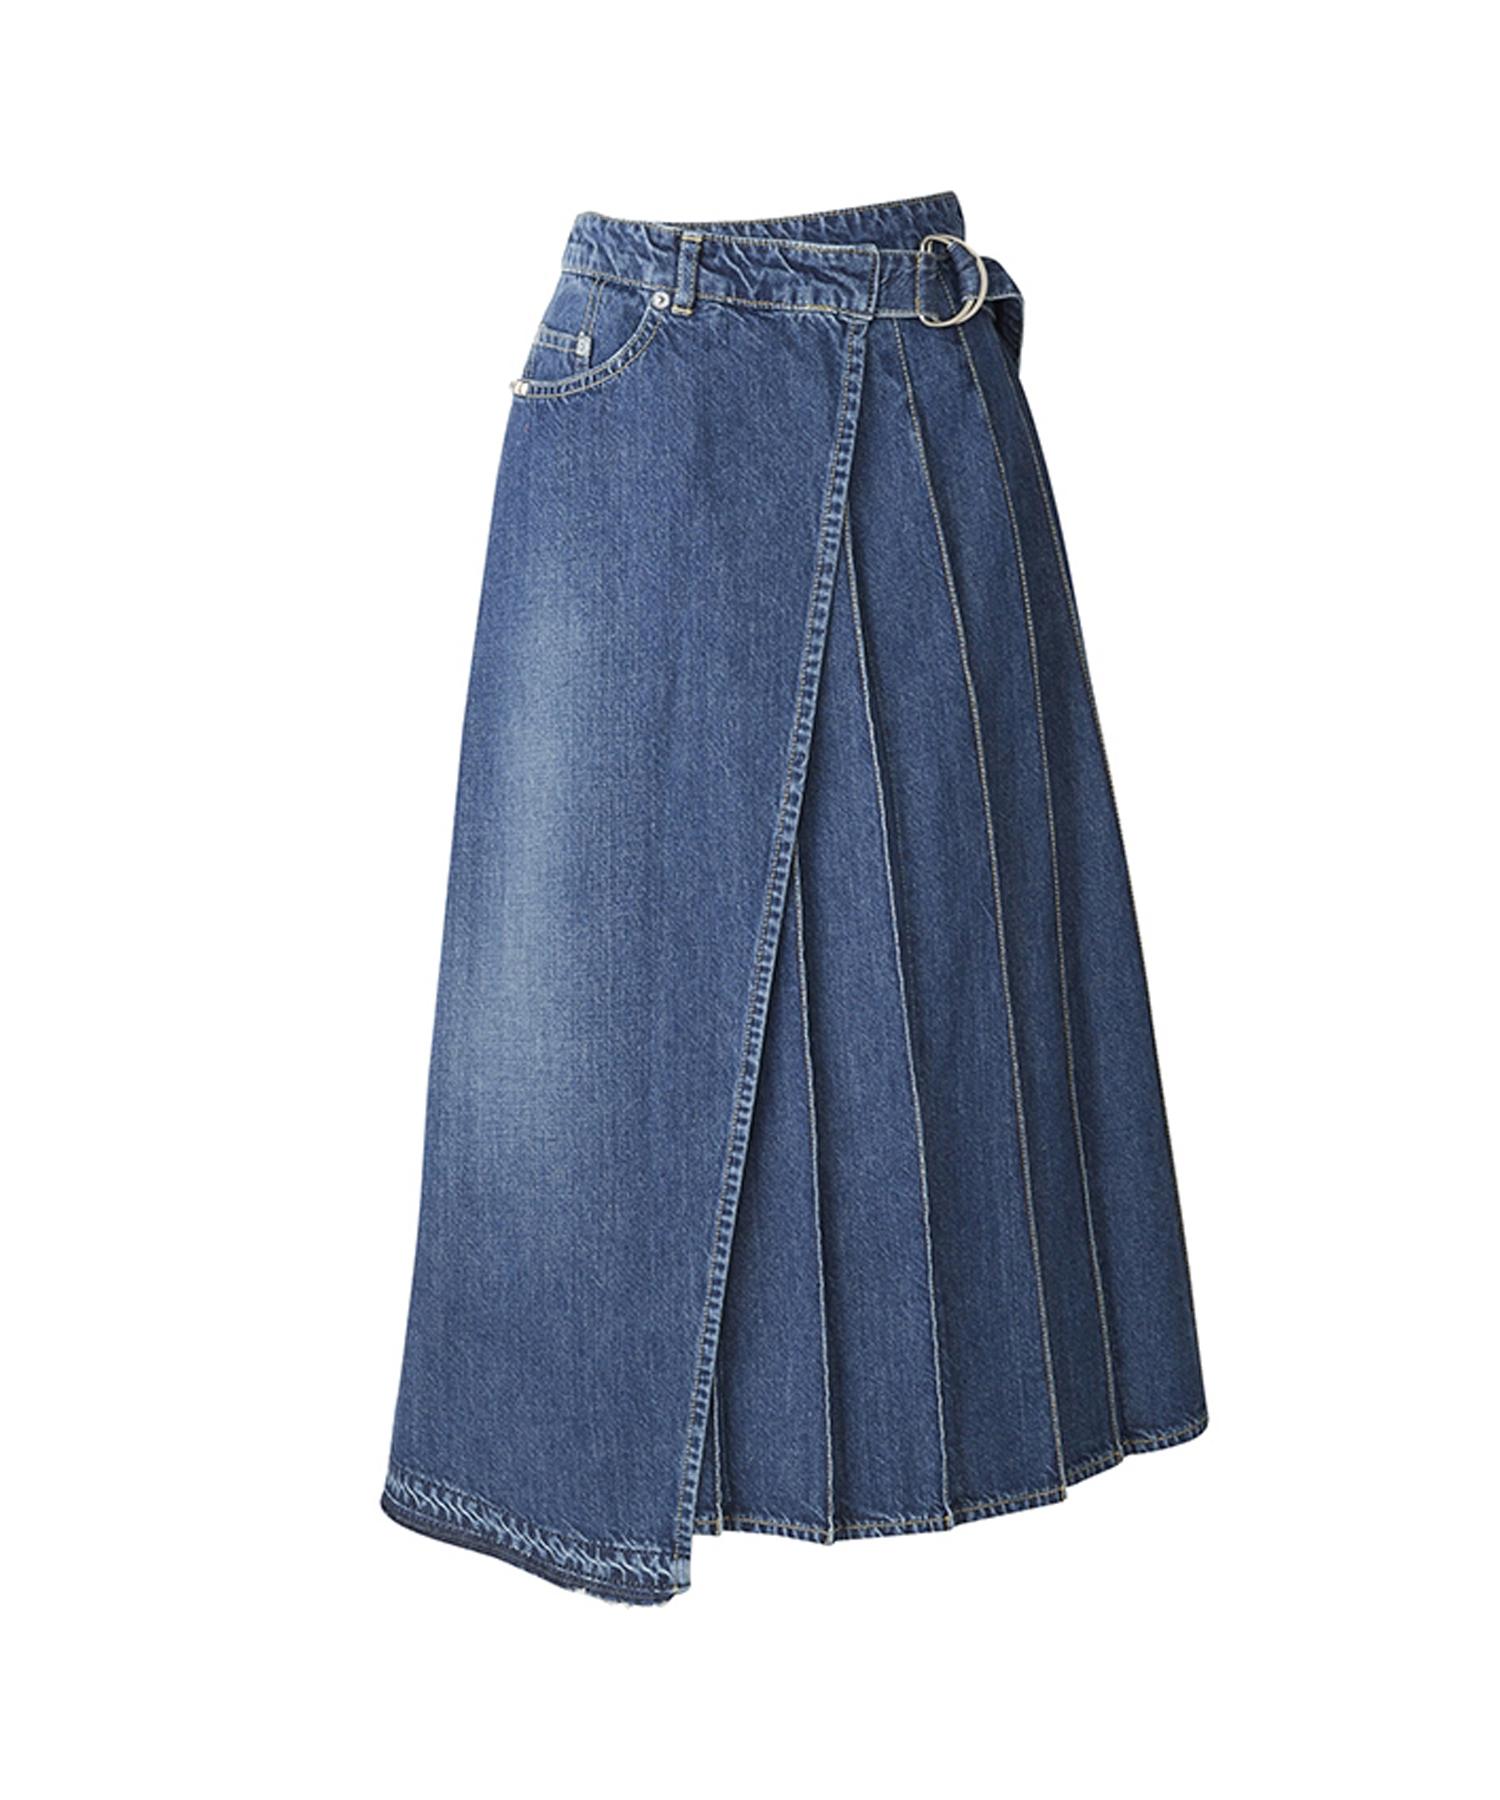 USED加工デニム ラッププリーツロングスカート